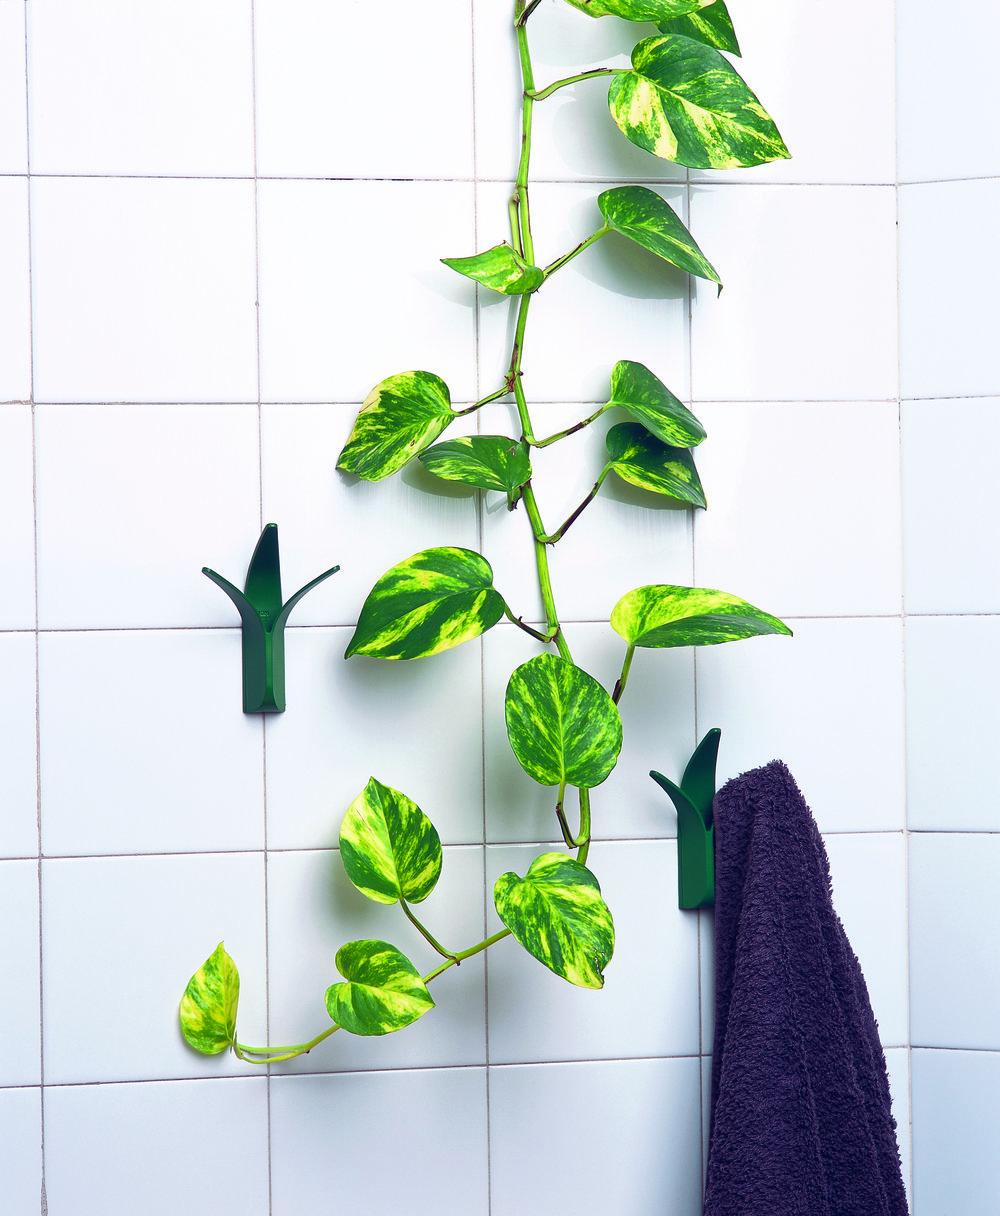 bsign-accesorios-productos-baño-colgador